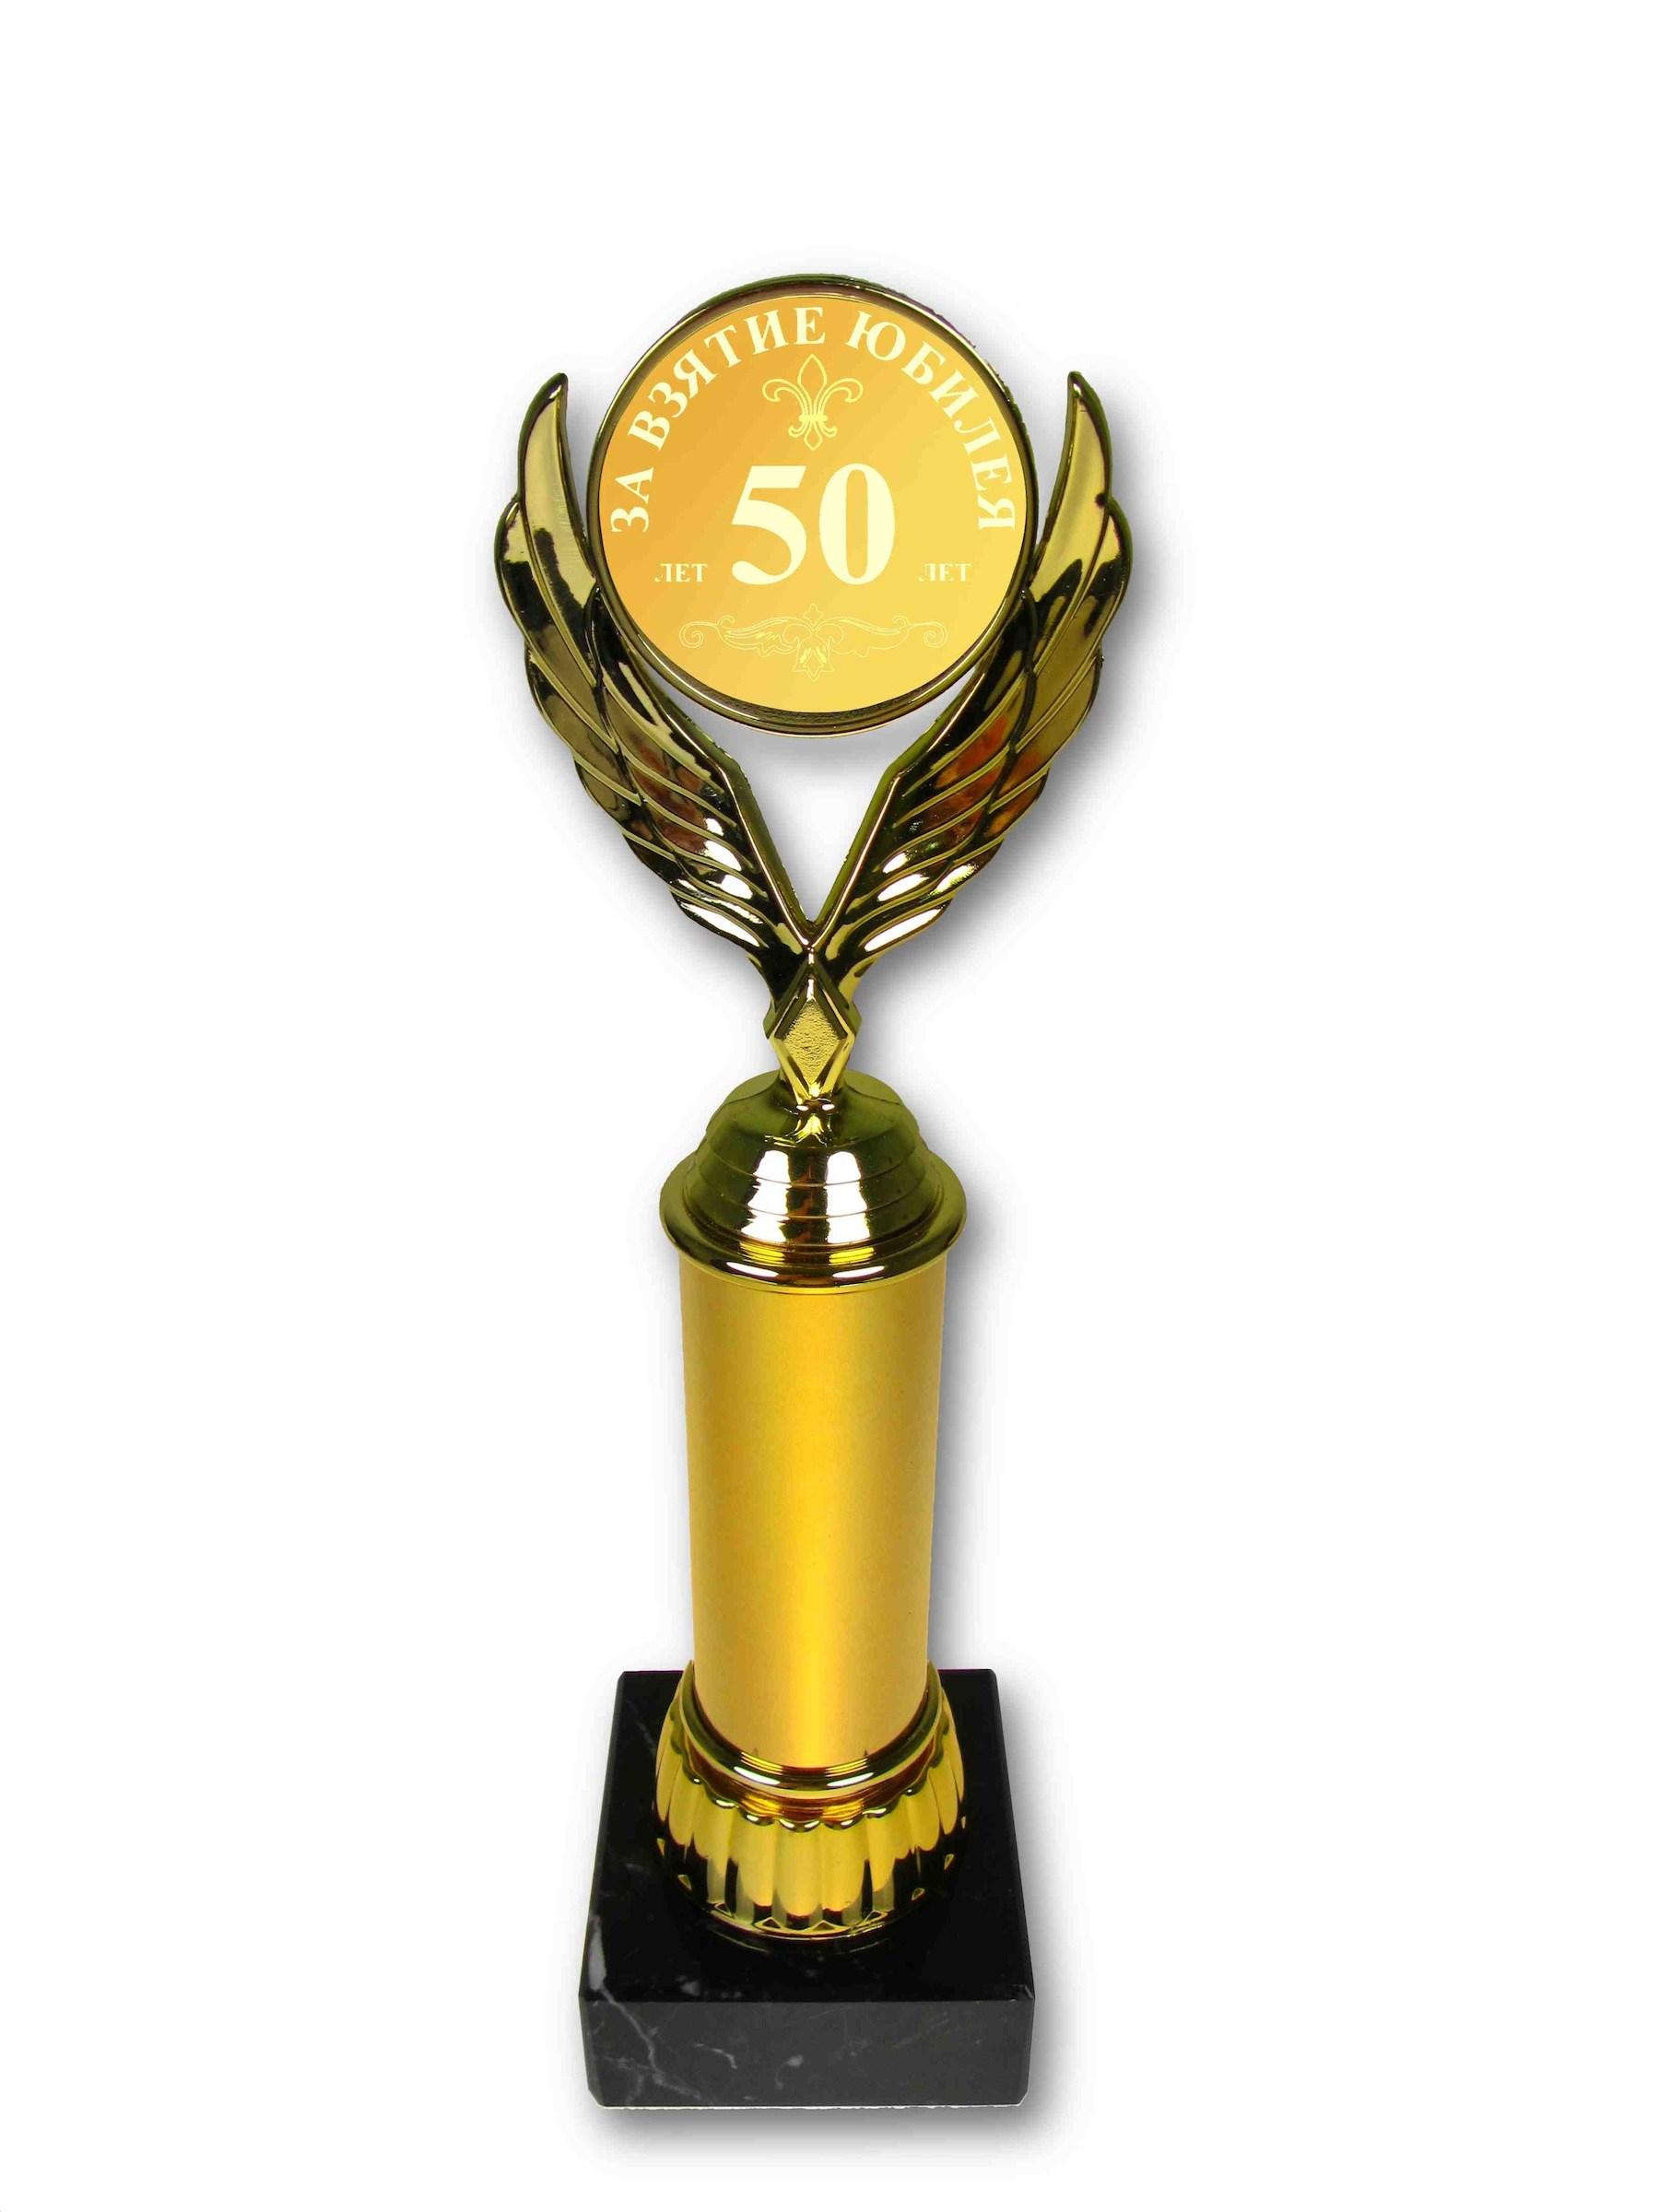 Наградная статуэтка «За взятие юбилея 50 лет»